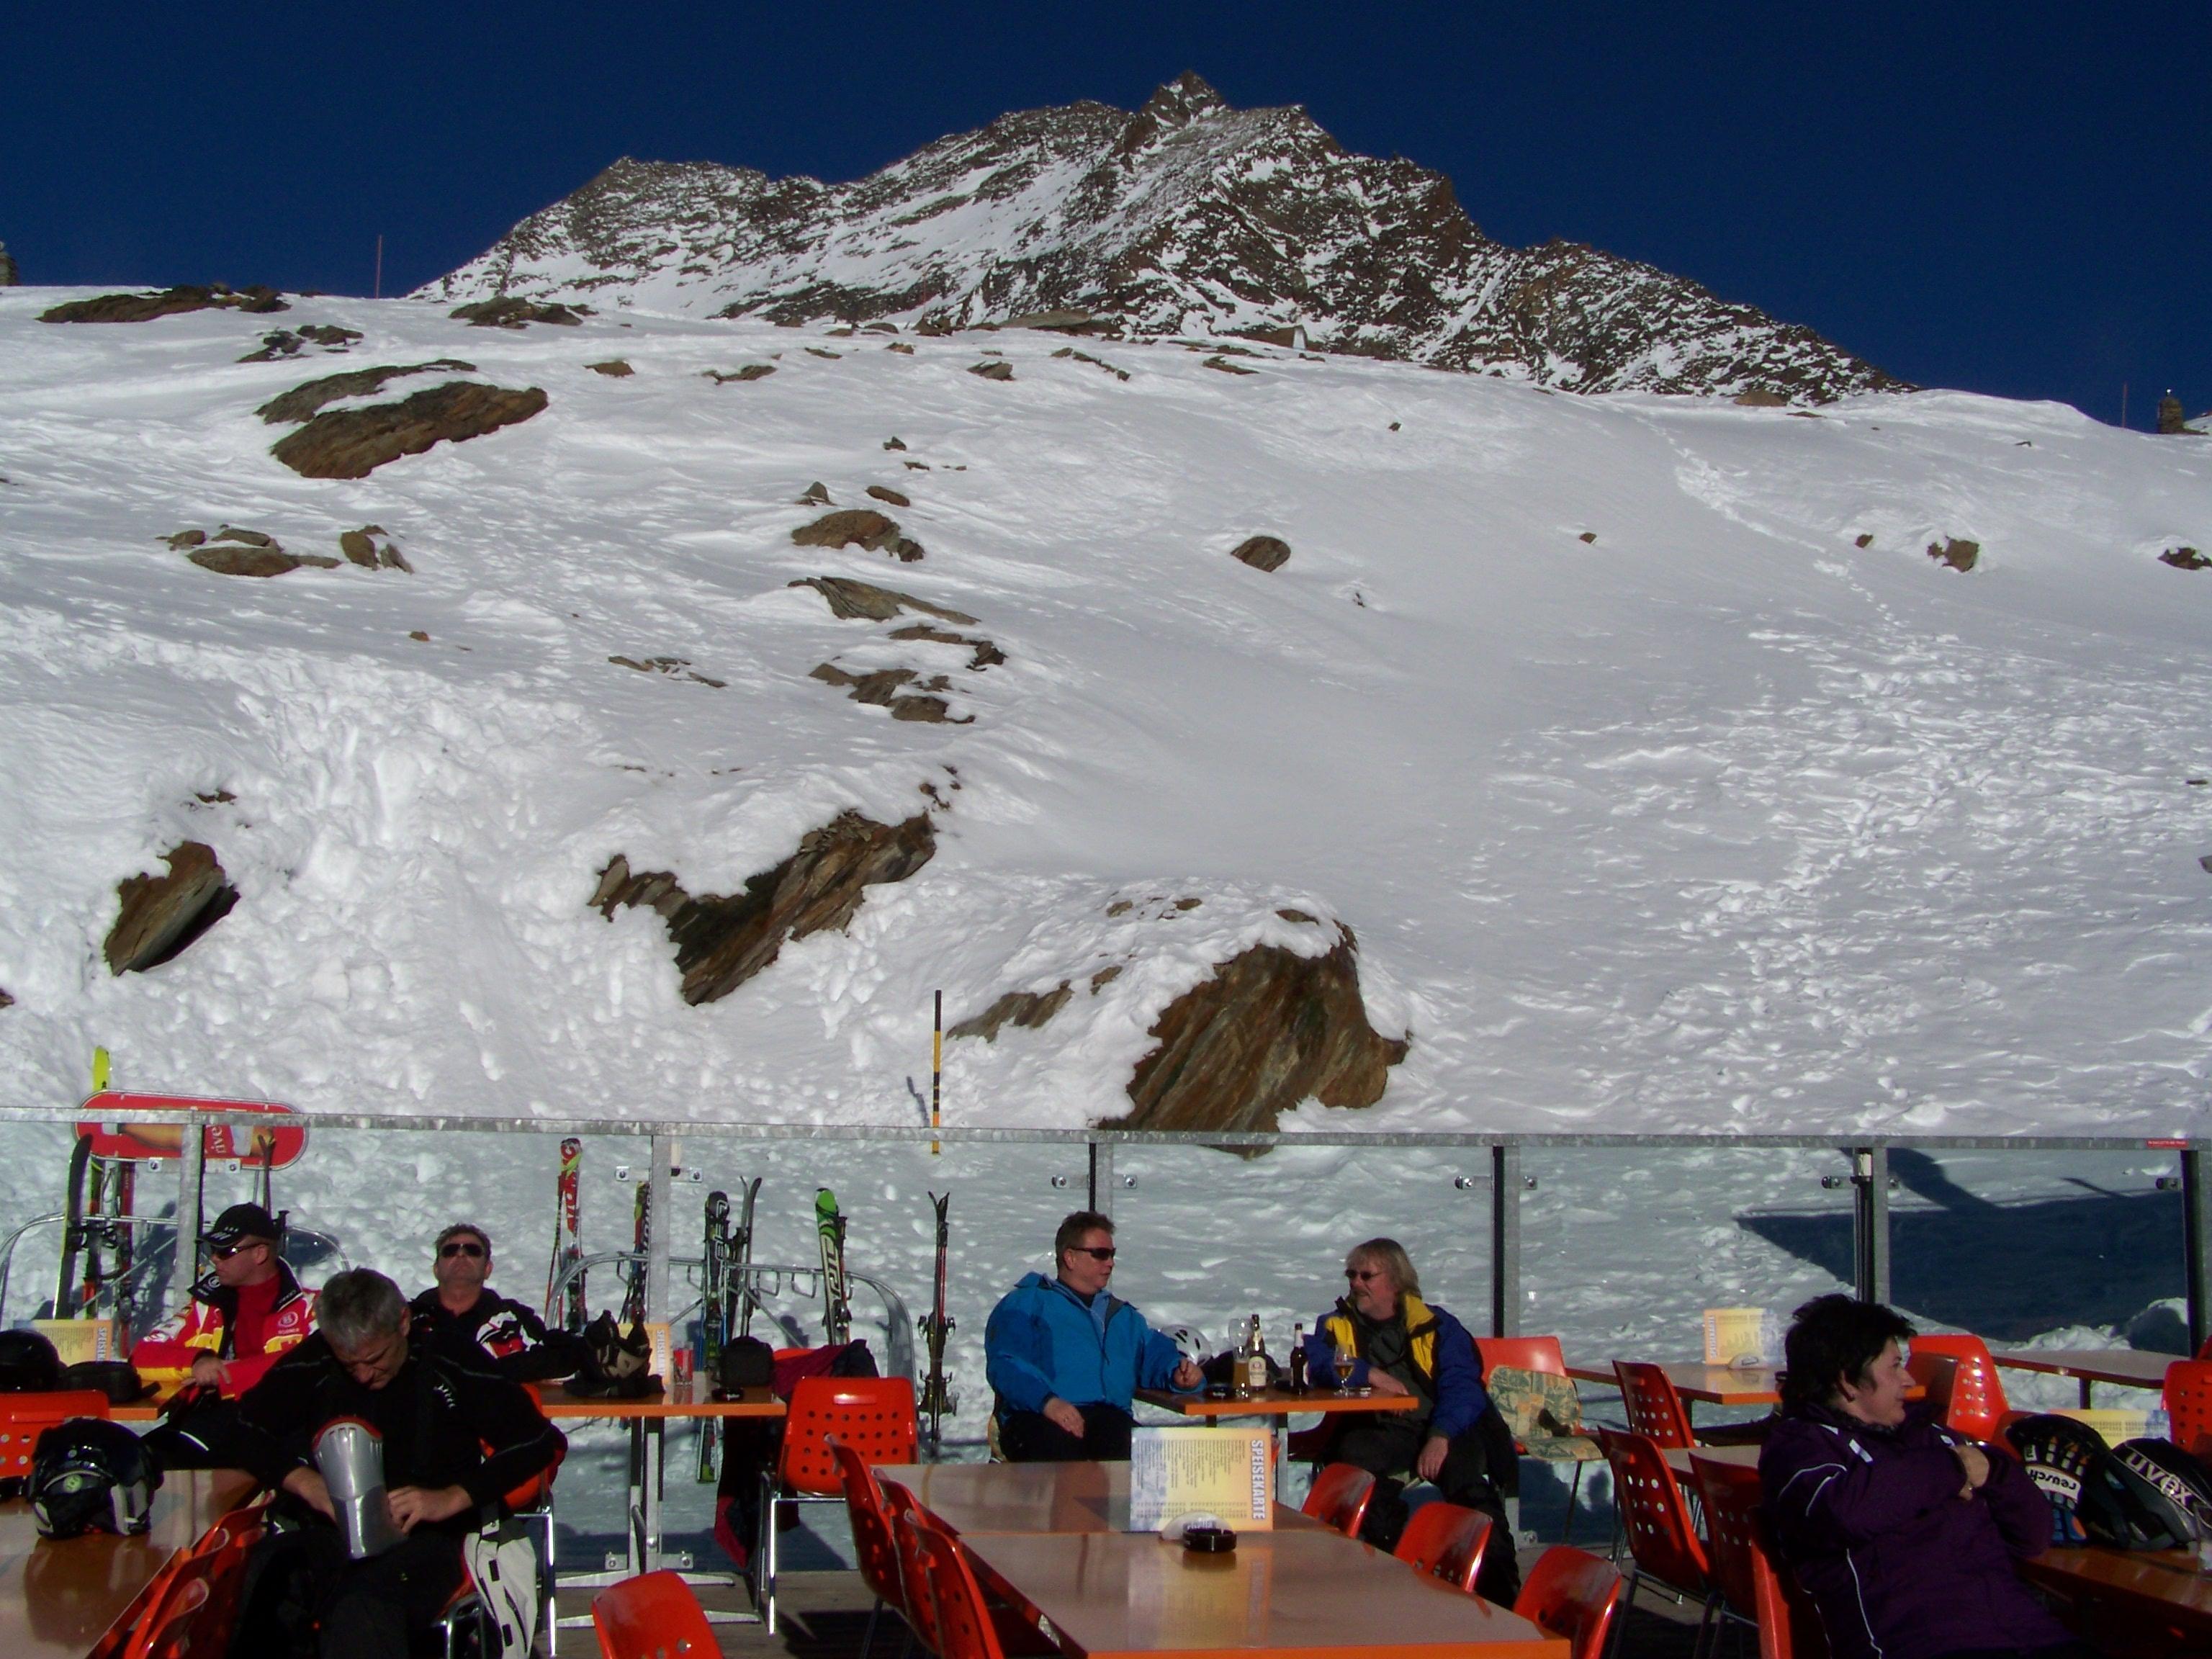 Saas Grund Οδηγός Χιονοδρομικού Κέντρου